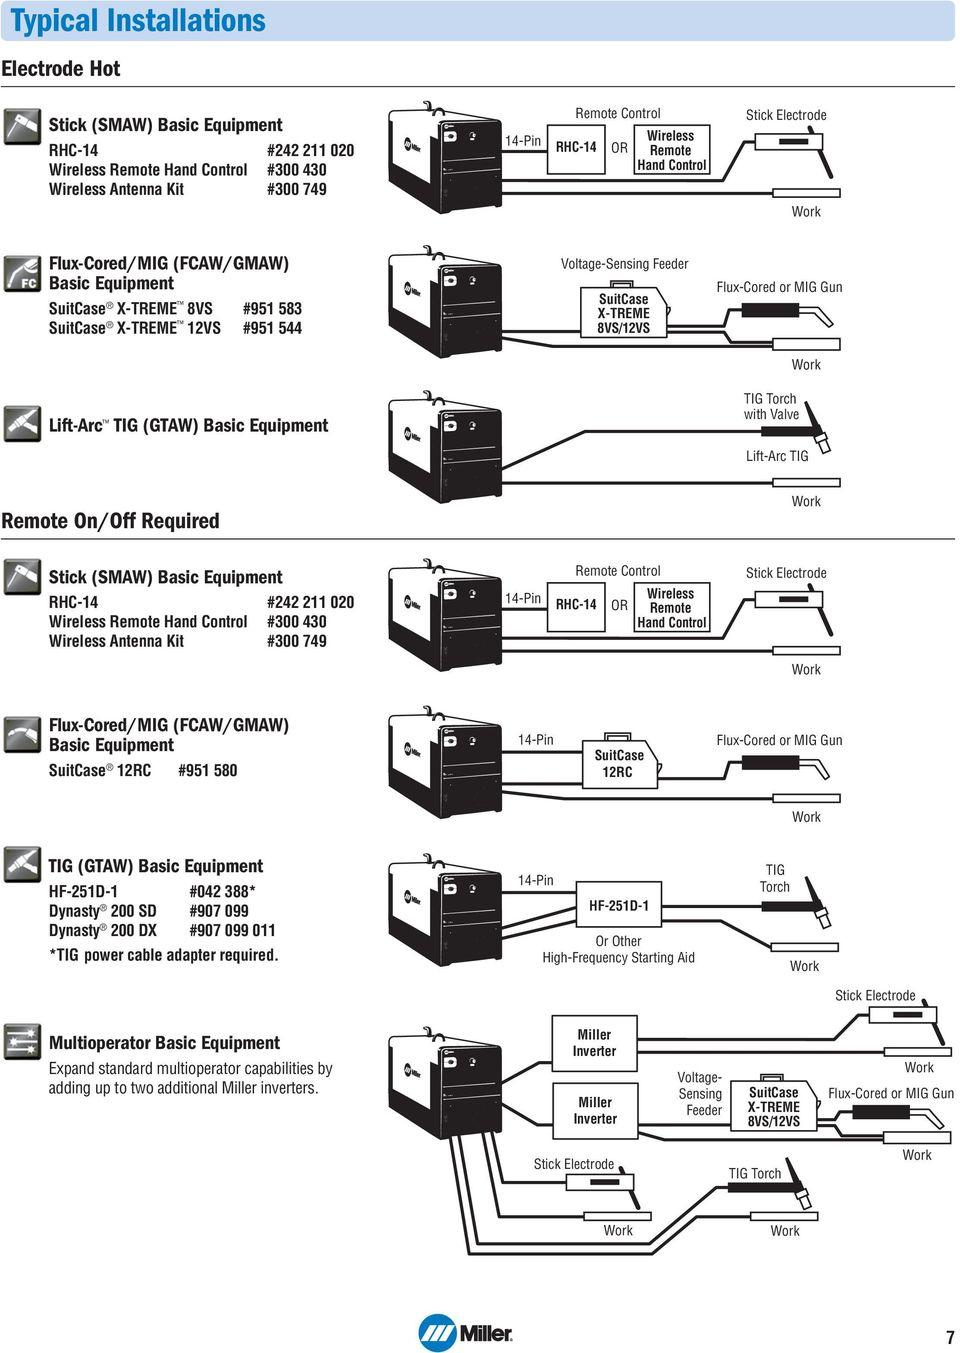 Telsta T40C Wiring Diagram | Wiring Library - Bbbind Wiring Diagram